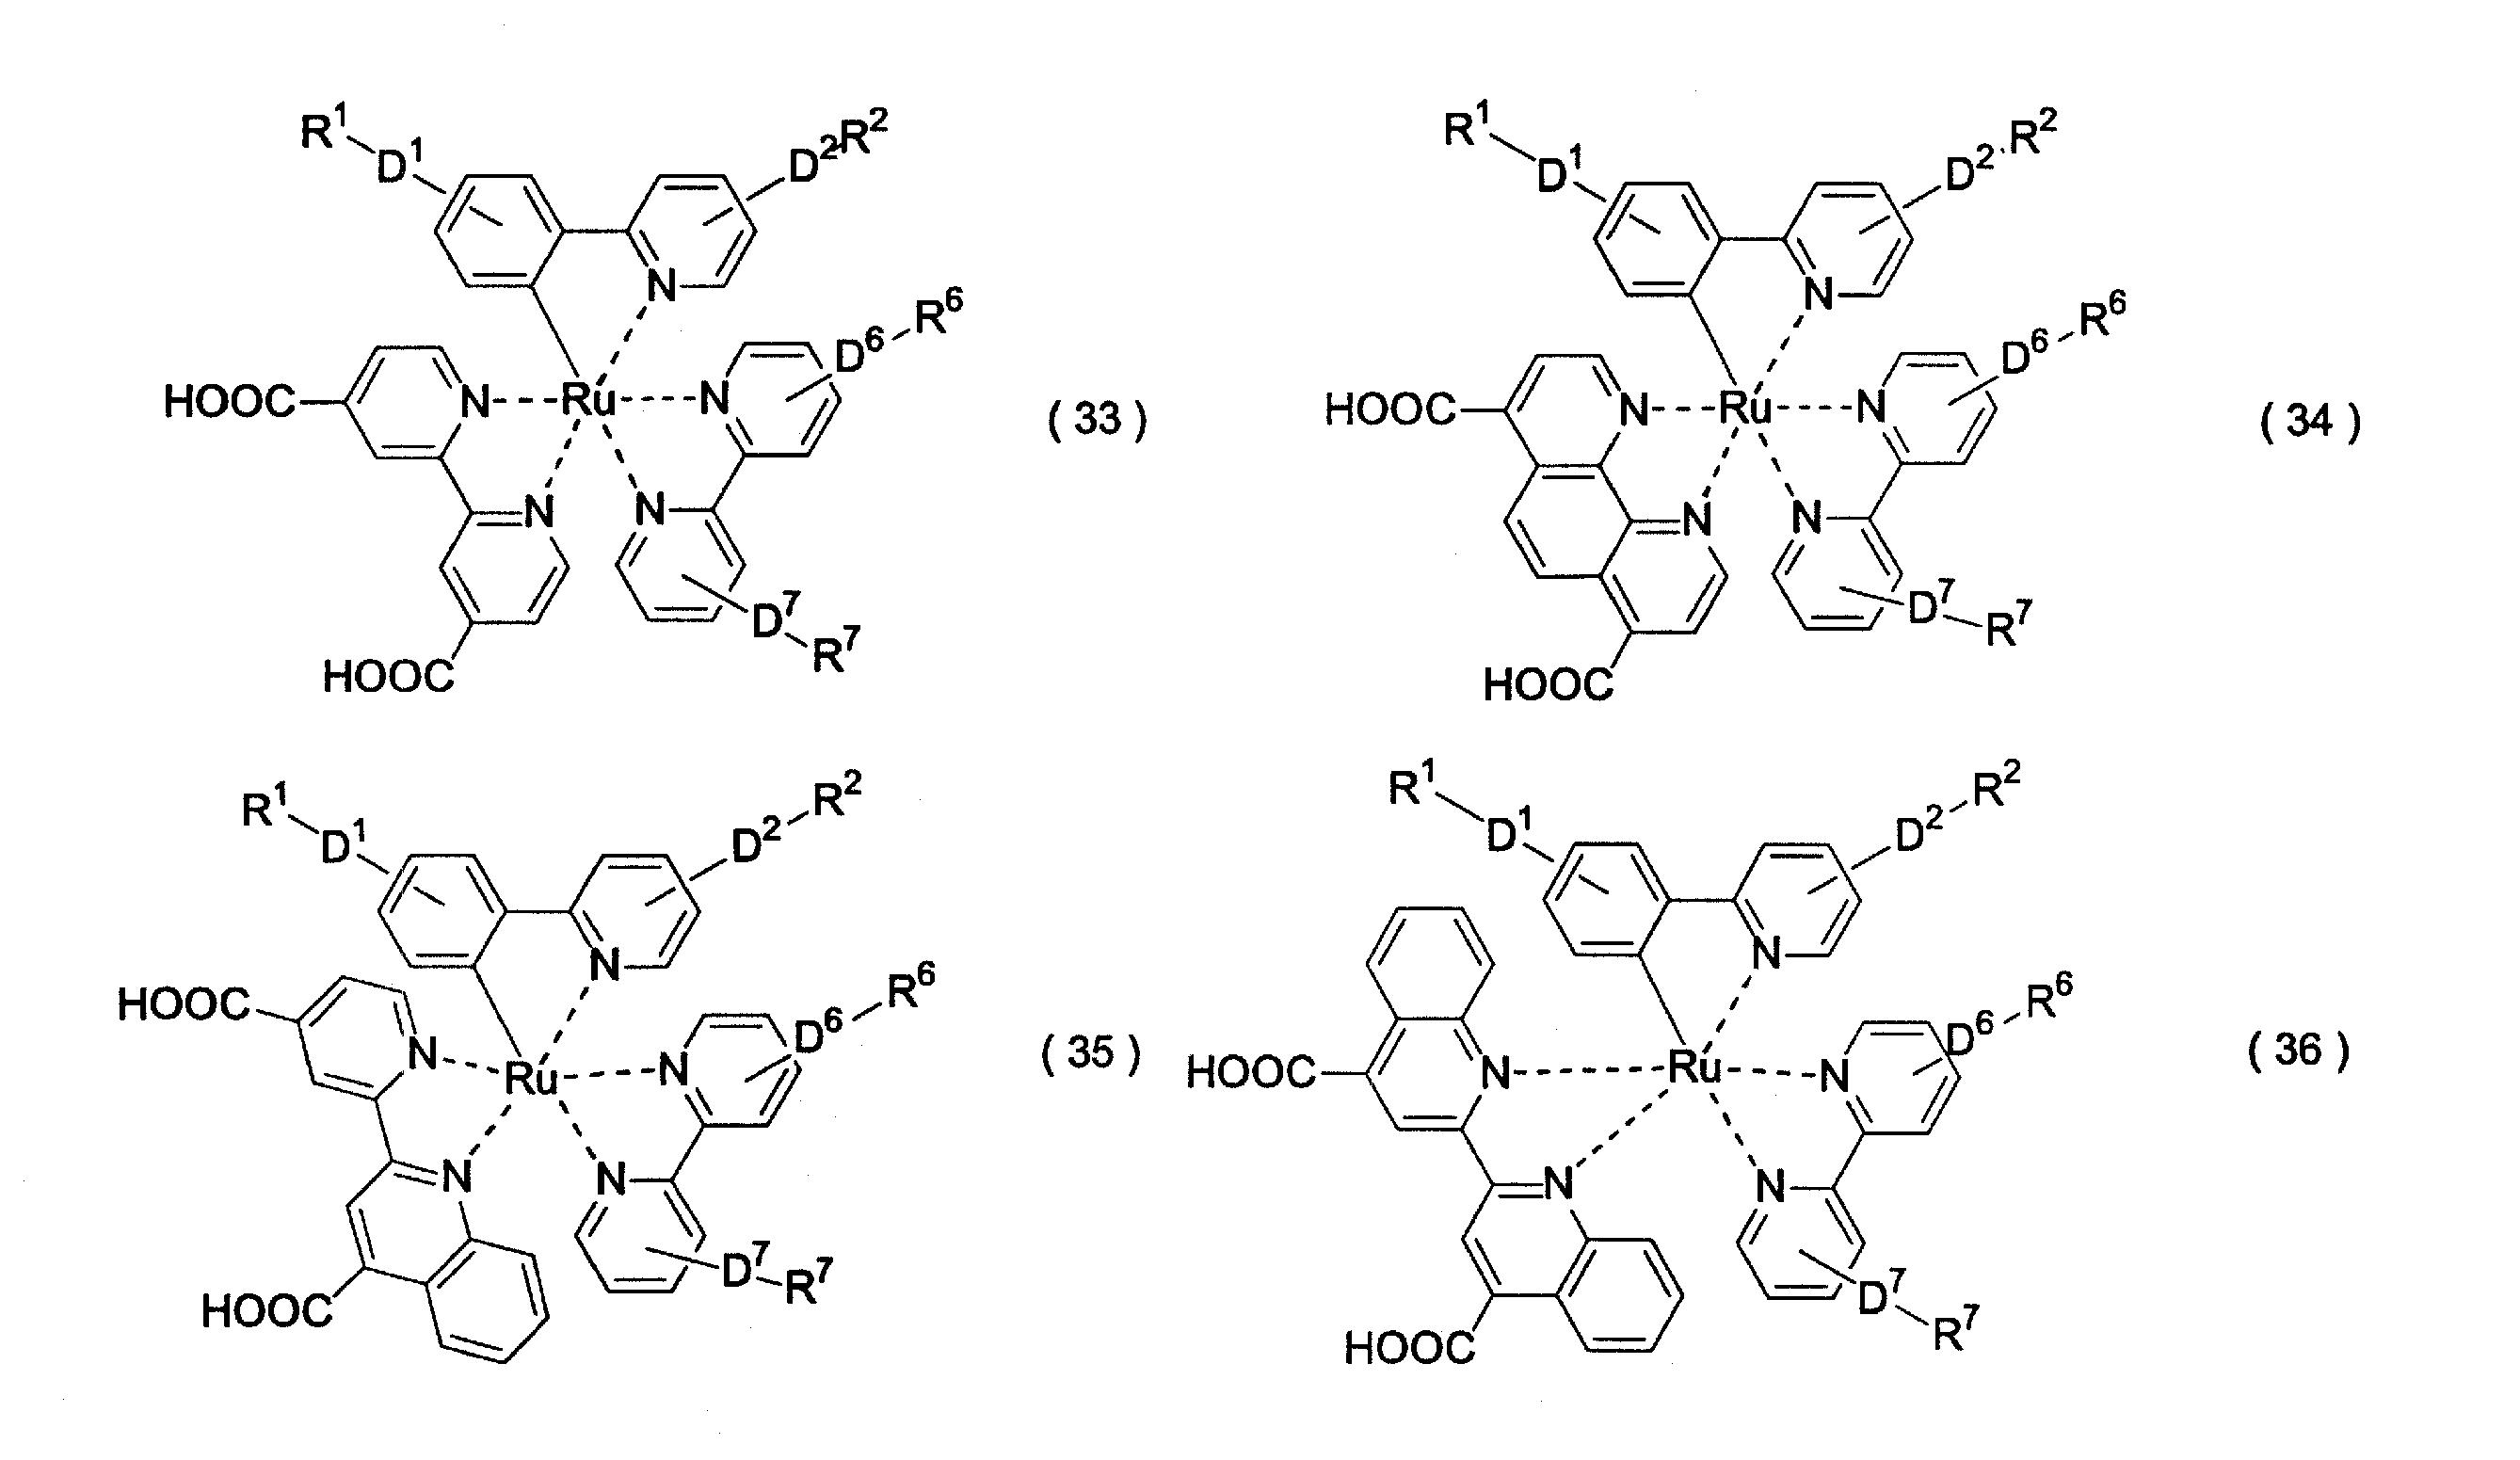 Patents                                                                                                                         Generate link with comments                           ピリジン系金属錯体、それを用いた光電極およびそれを備えた色素増感太陽電池